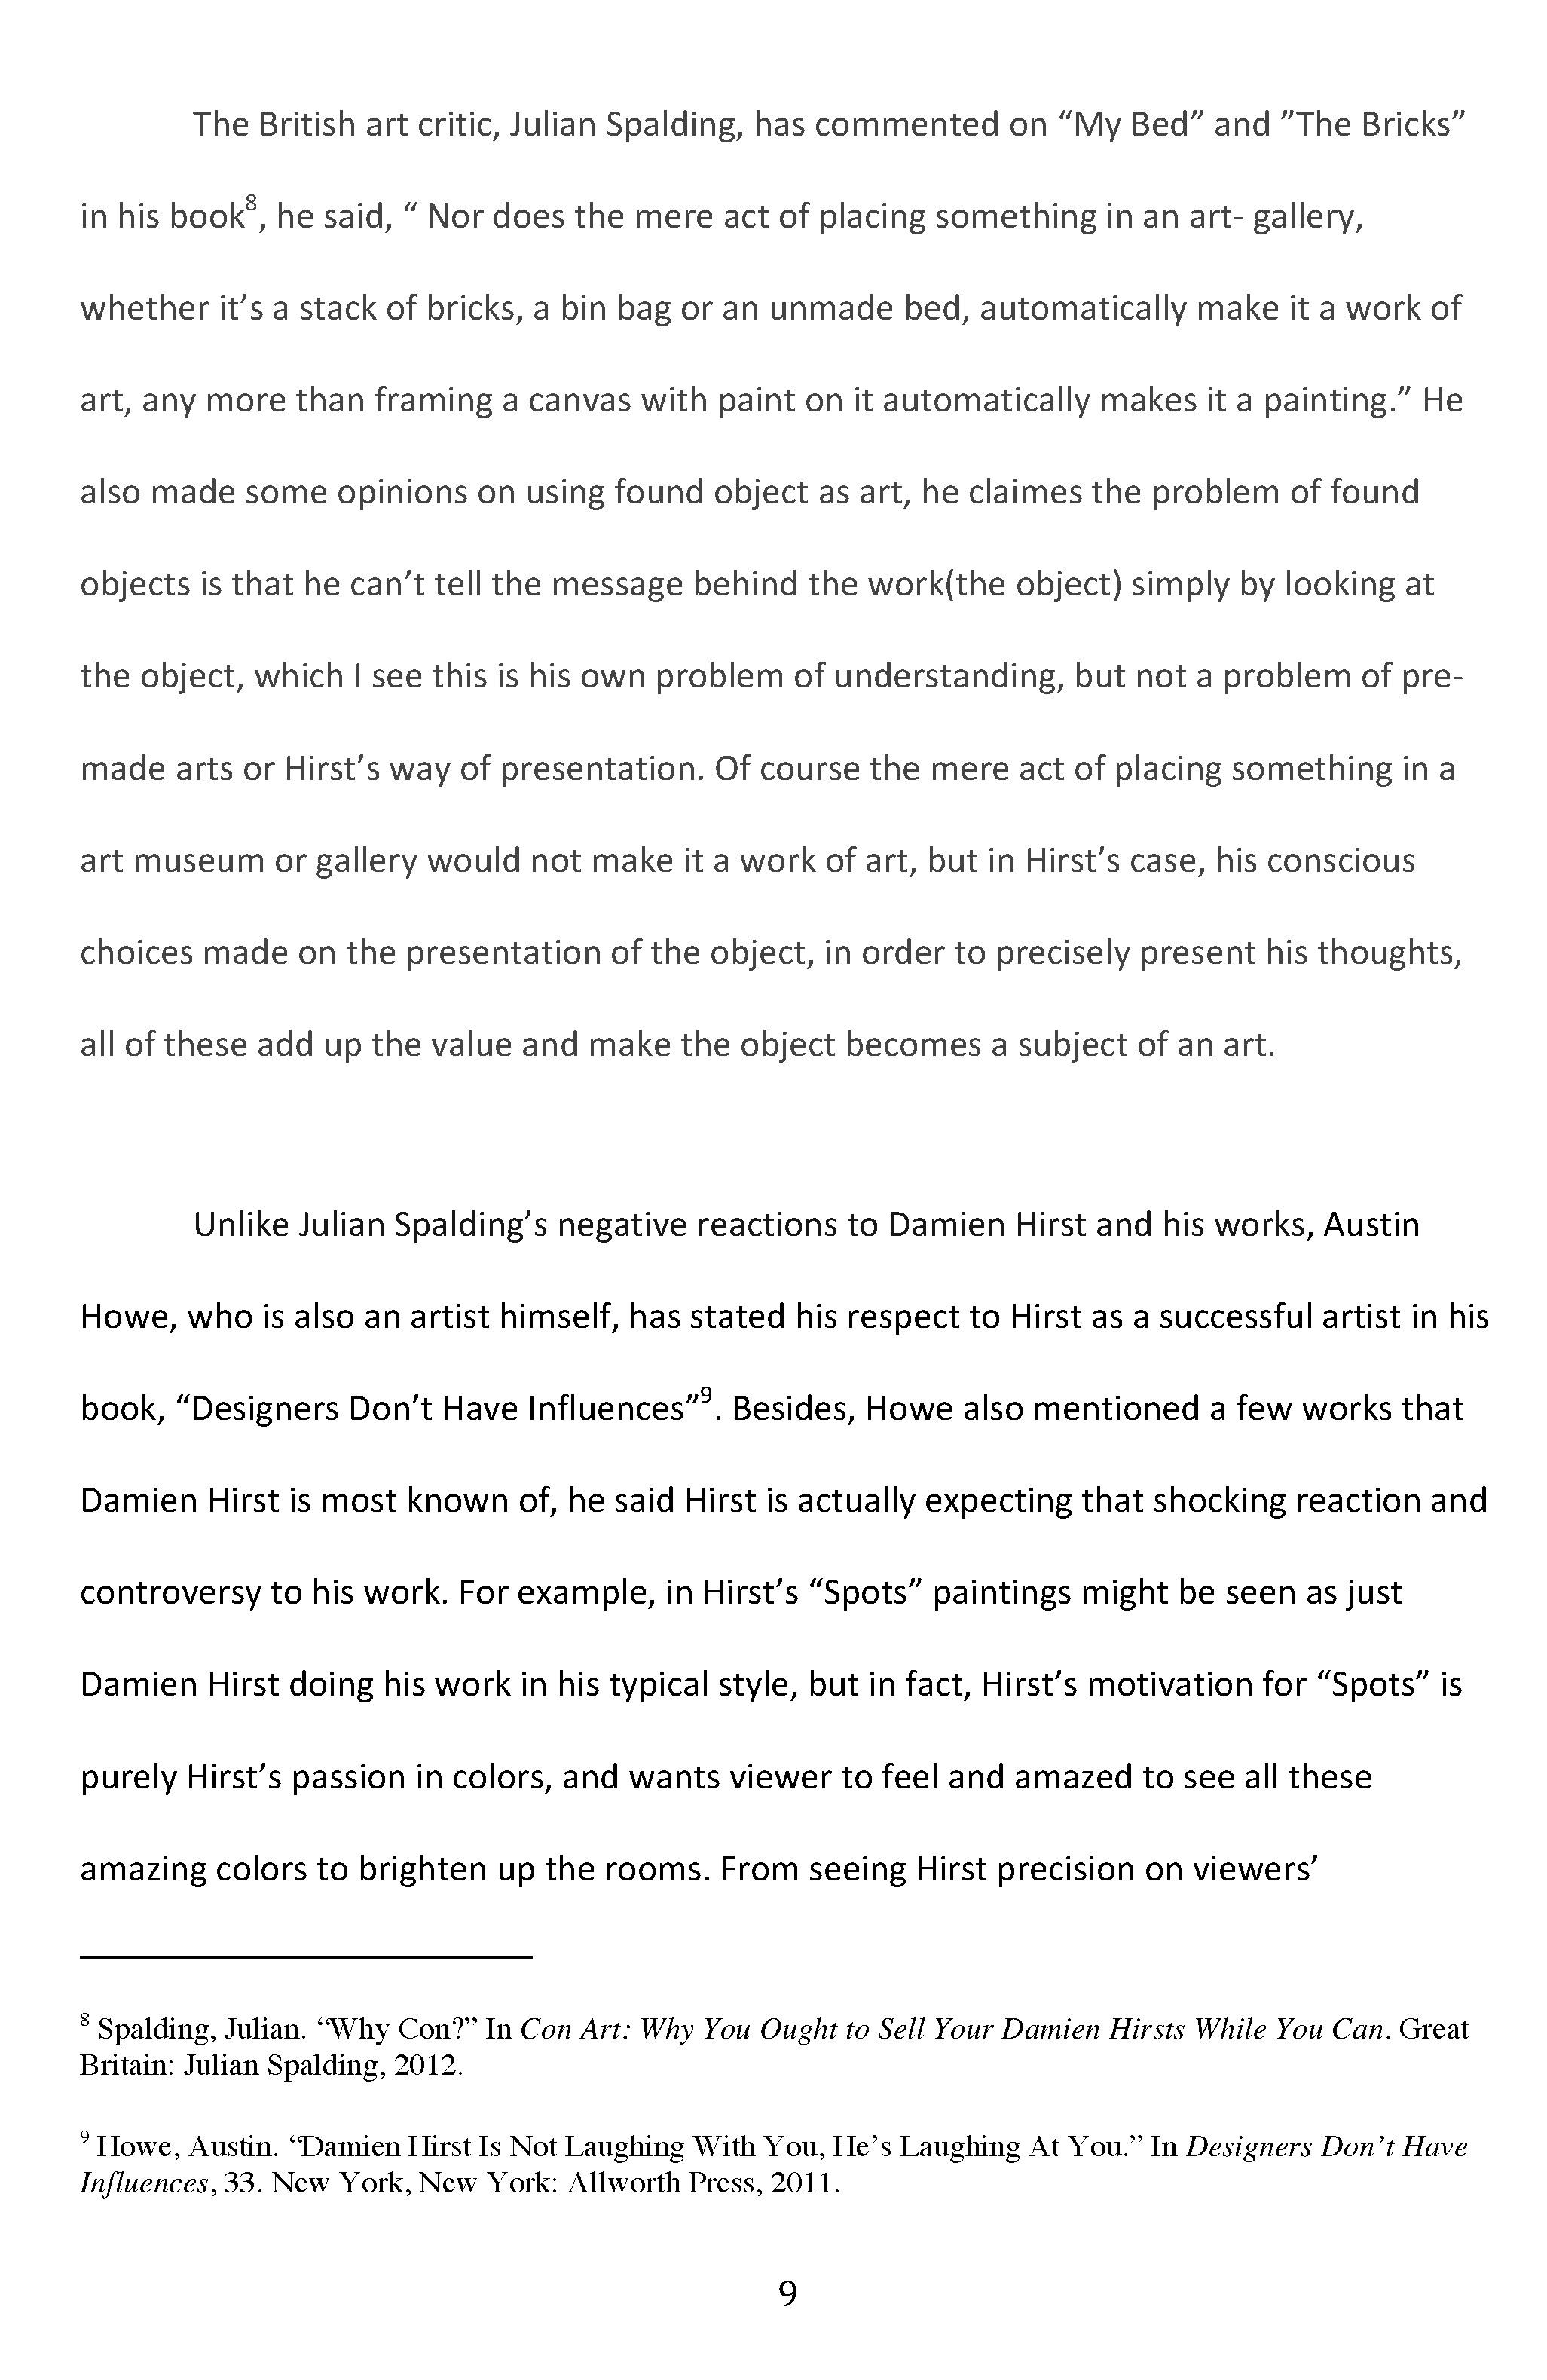 Int Seminar 2 Final Essay Is Damien Hirst A Real Artist